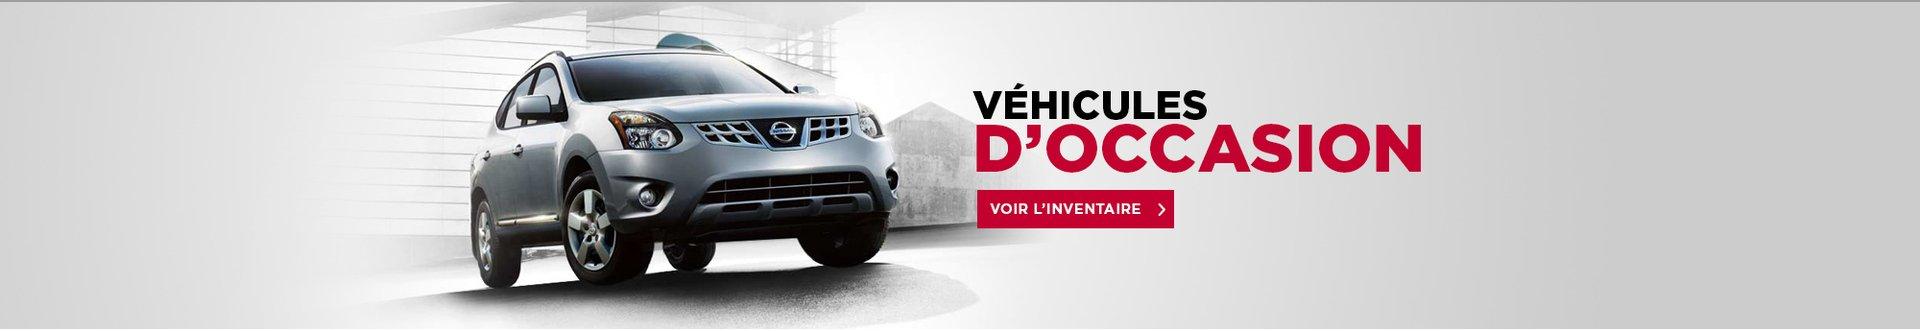 Honda Val D Or >> Poirier Nissan   Concessionnaire Nissan à Rouyn-Noranda ...